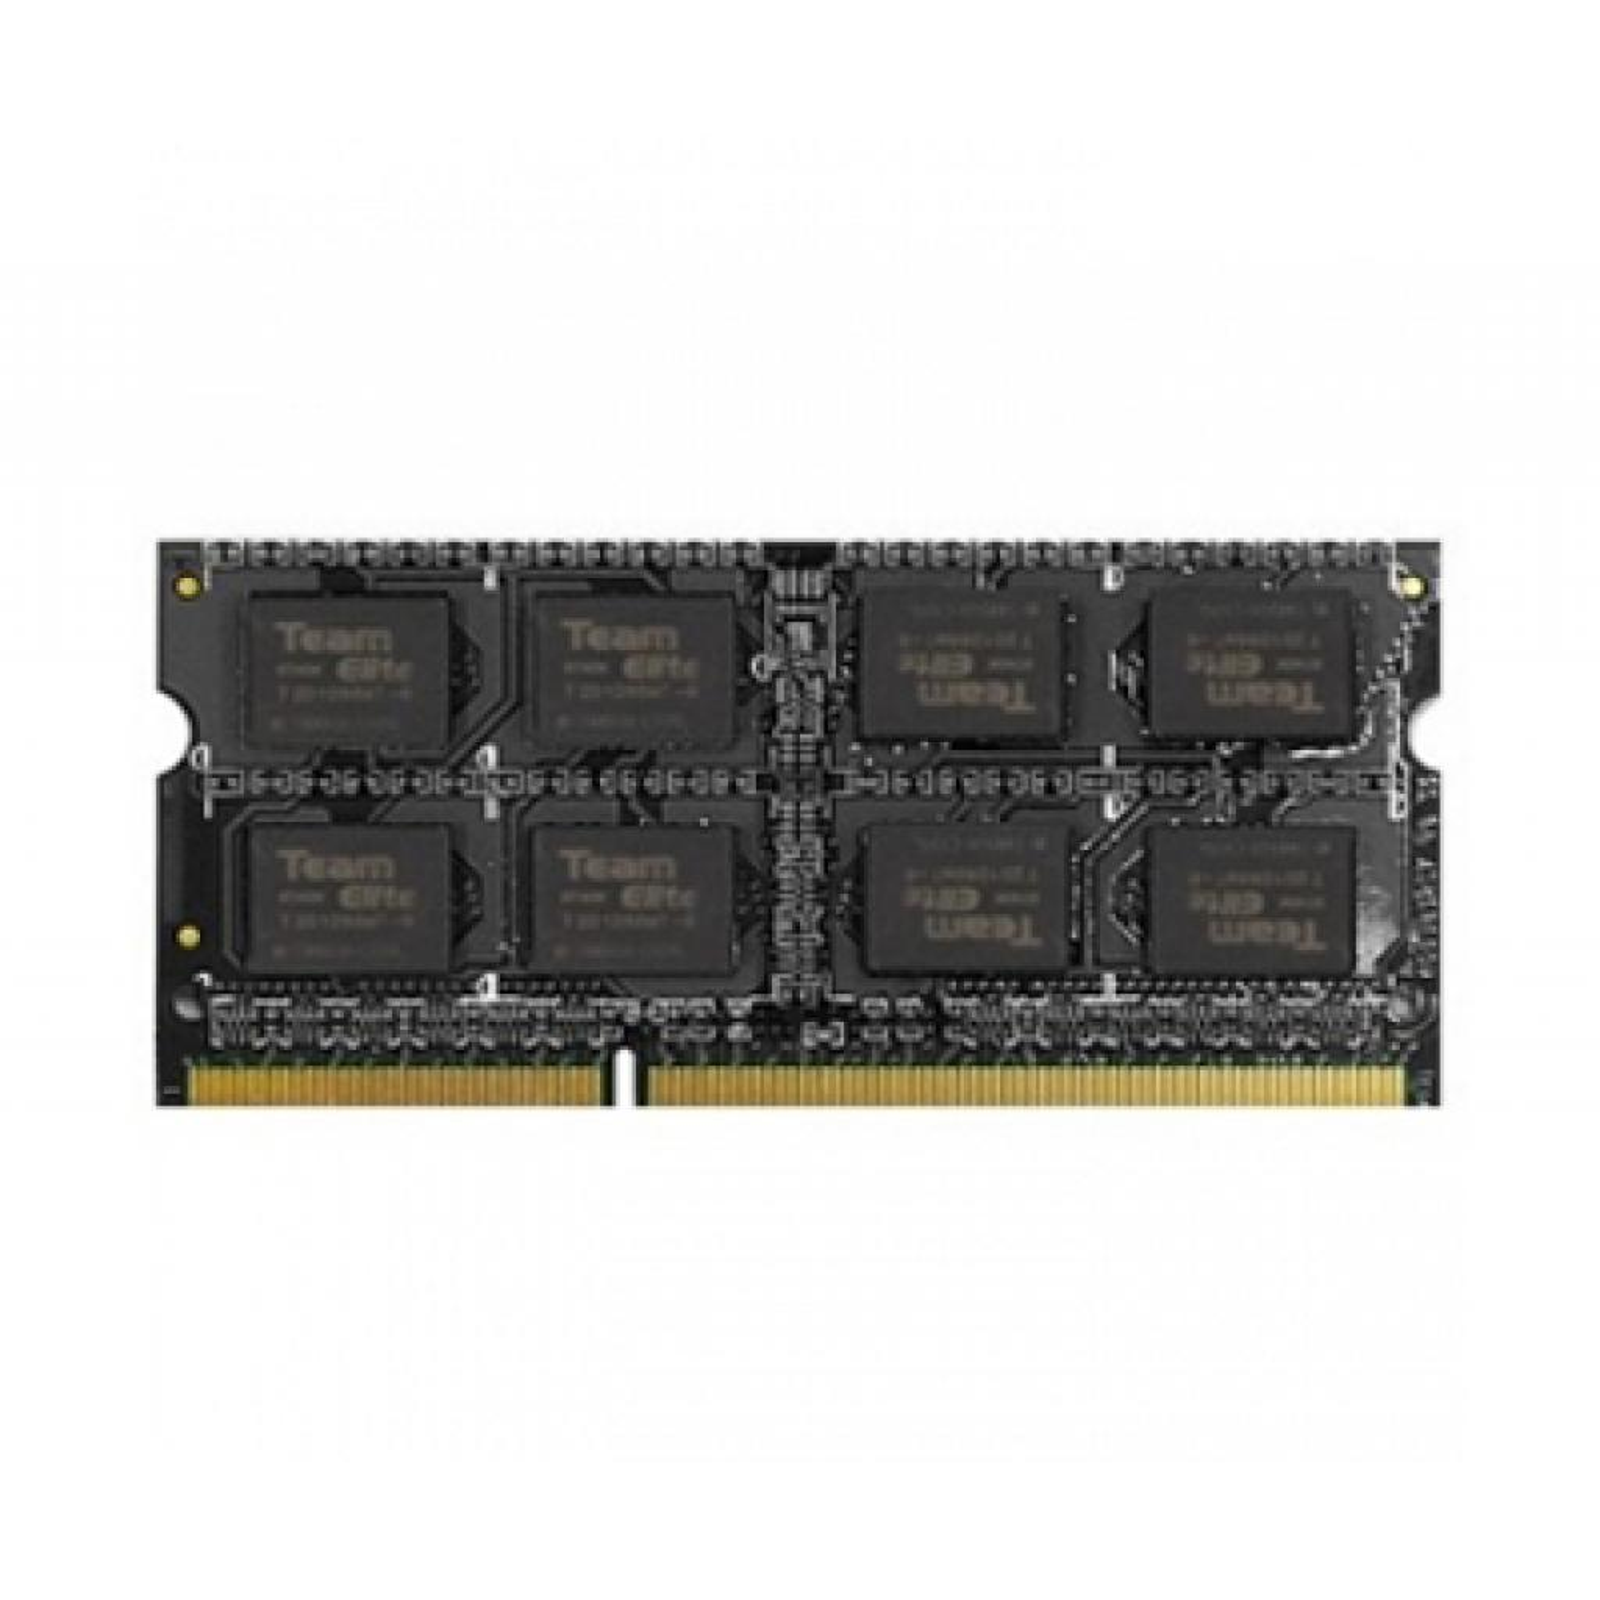 Модуль памяти для компьютера DDR2 2GB 800 MHz Team (TED22G800C5-SBK) изображение 2